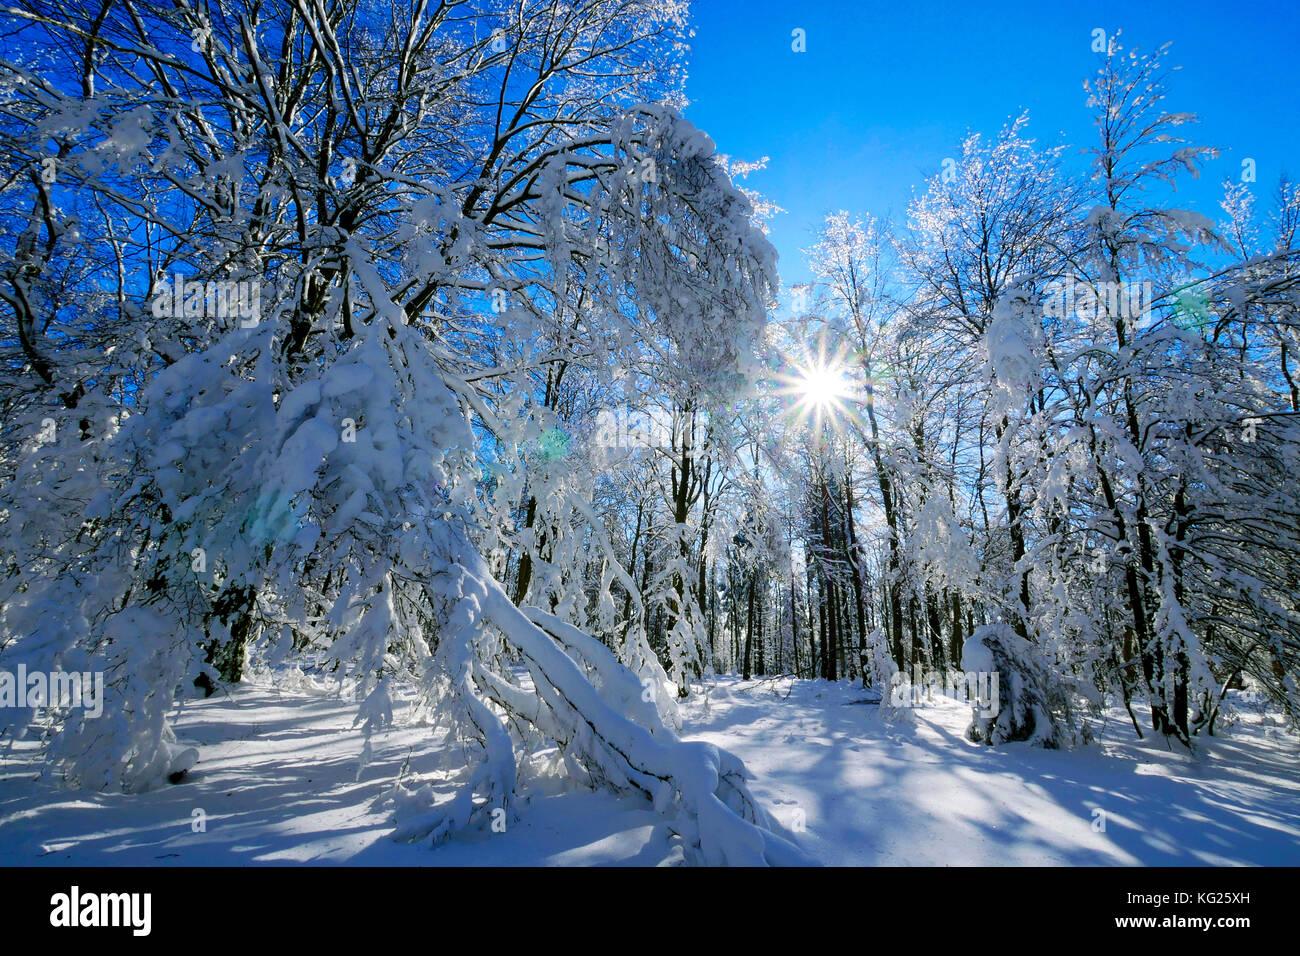 Wald im Winter, erbeskopf Berg, 816 m, Saar-hunsrueck Natur Park, Rheinland - Pfalz, Deutschland, Europa Stockbild